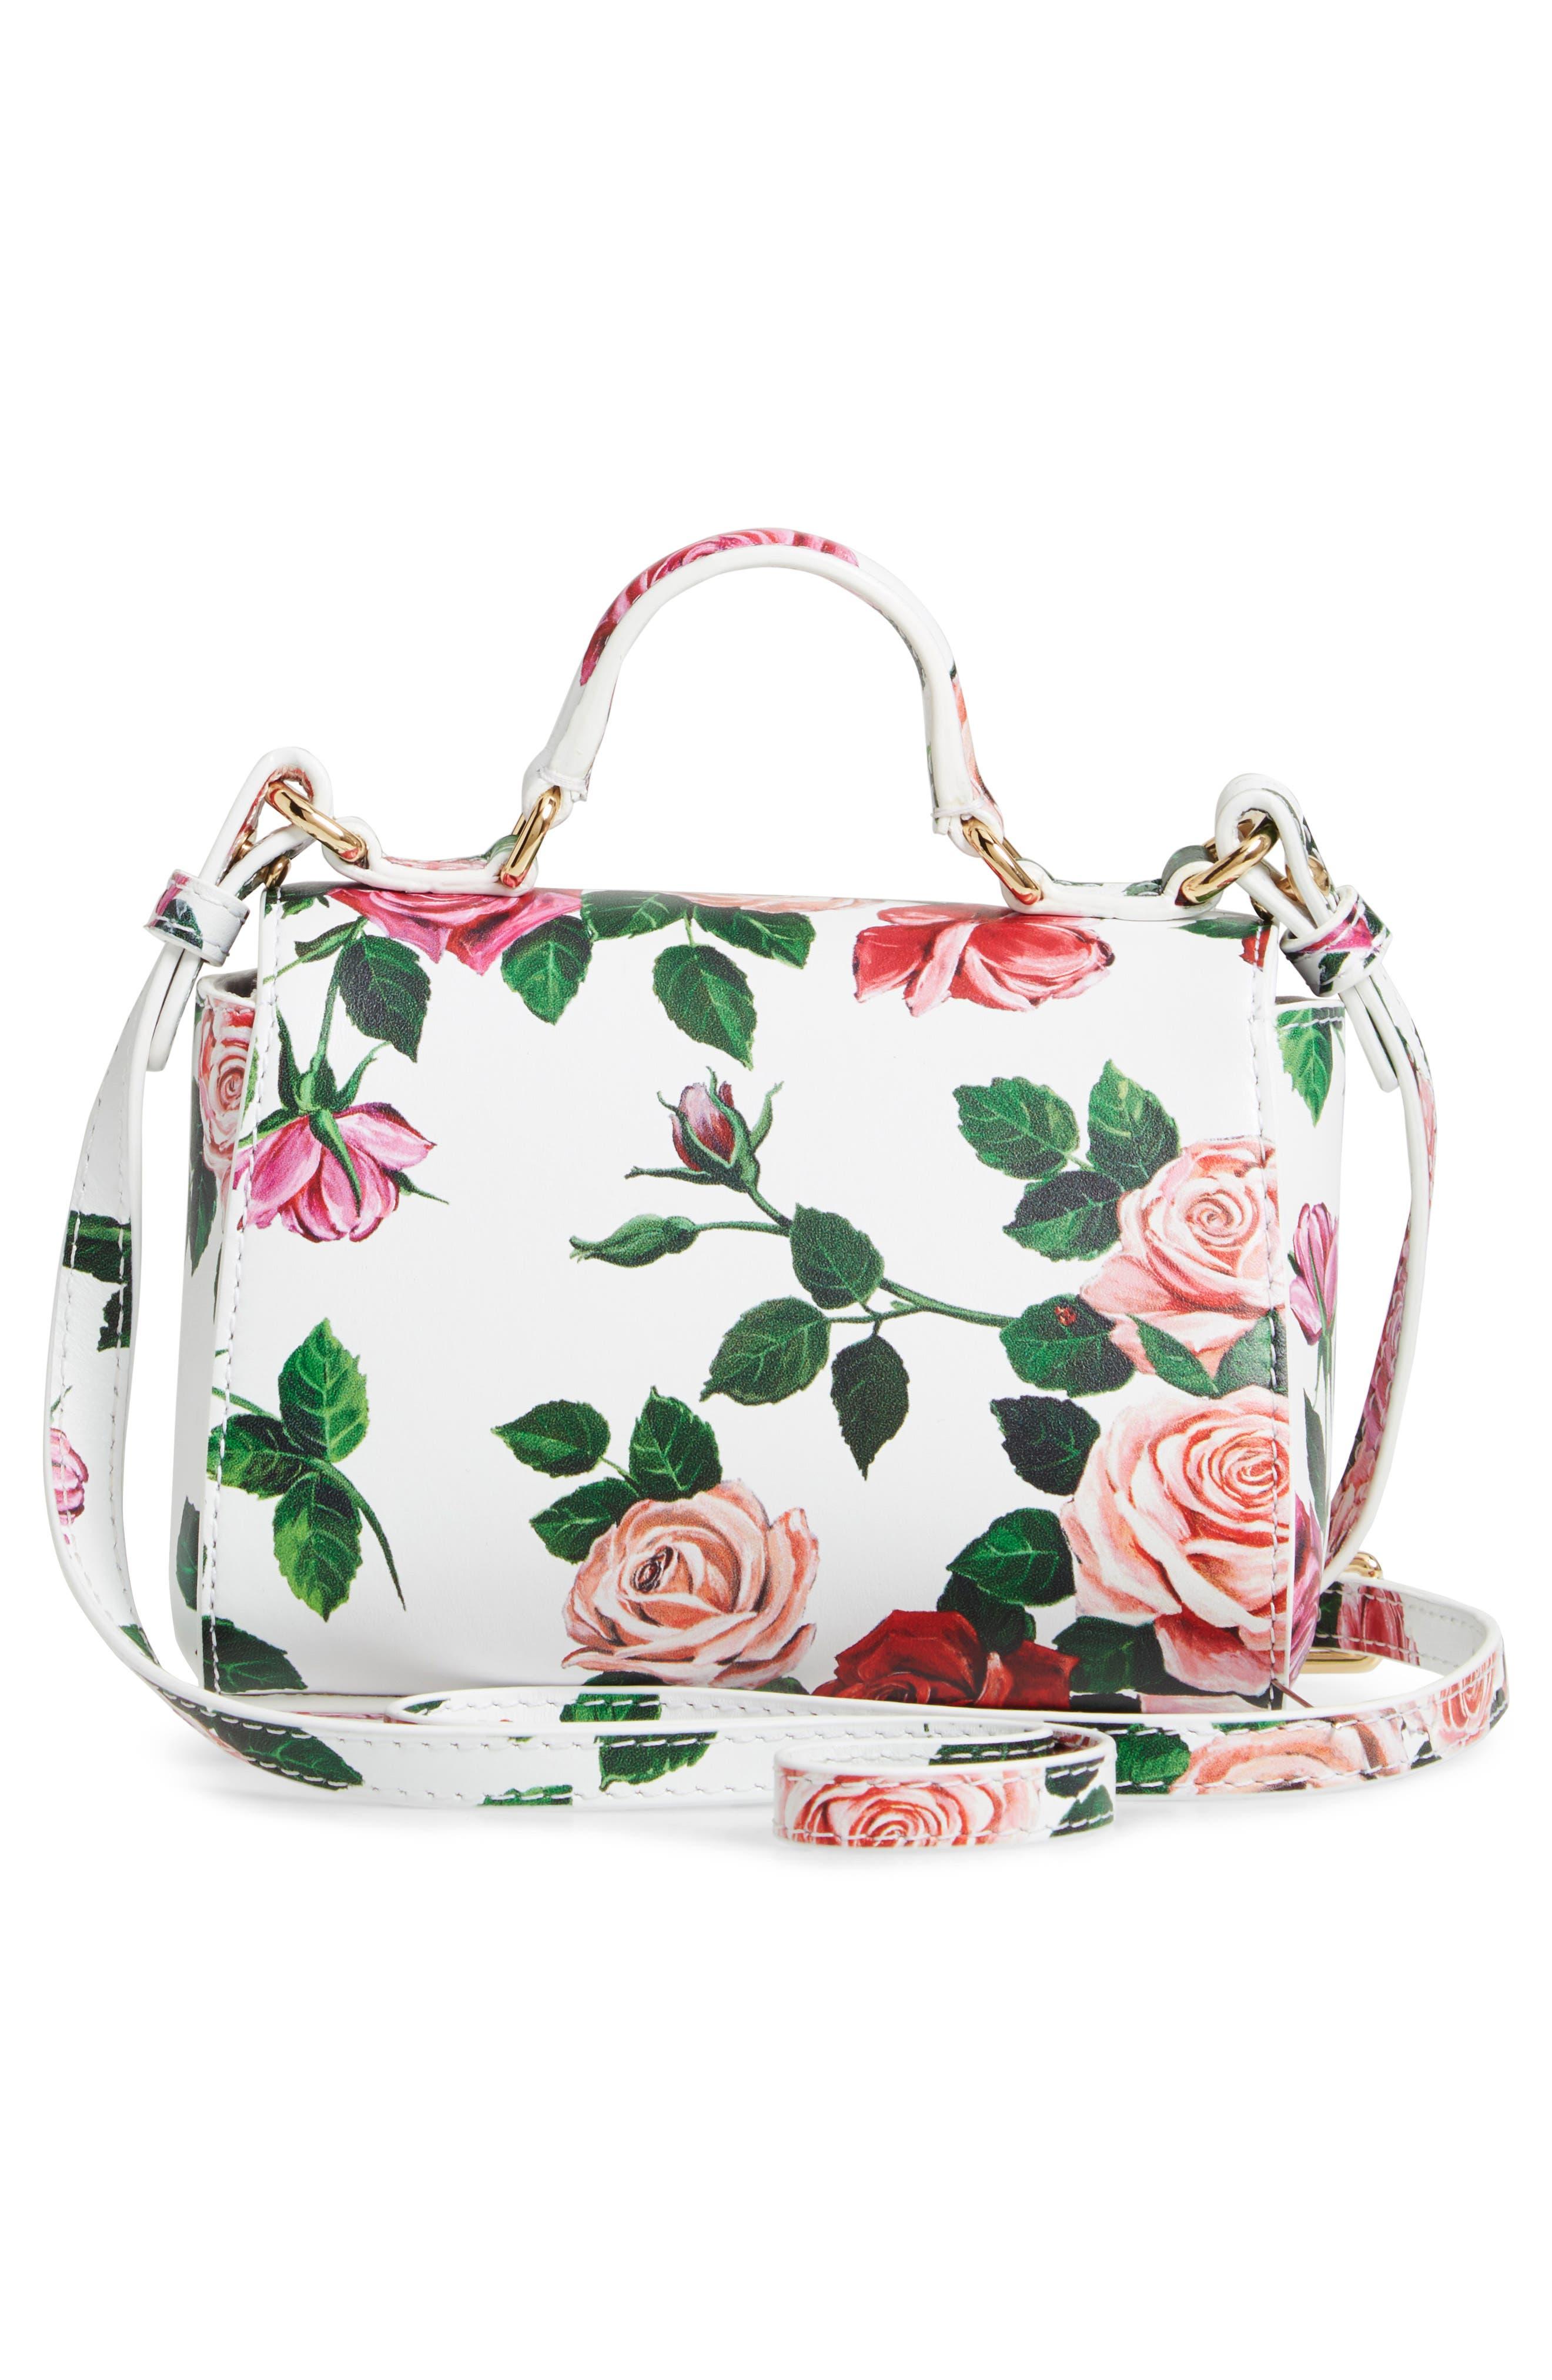 DOLCE&GABBANA,                             Floral Print Handbag,                             Alternate thumbnail 2, color,                             MIX ROSE FDO BCO NAT